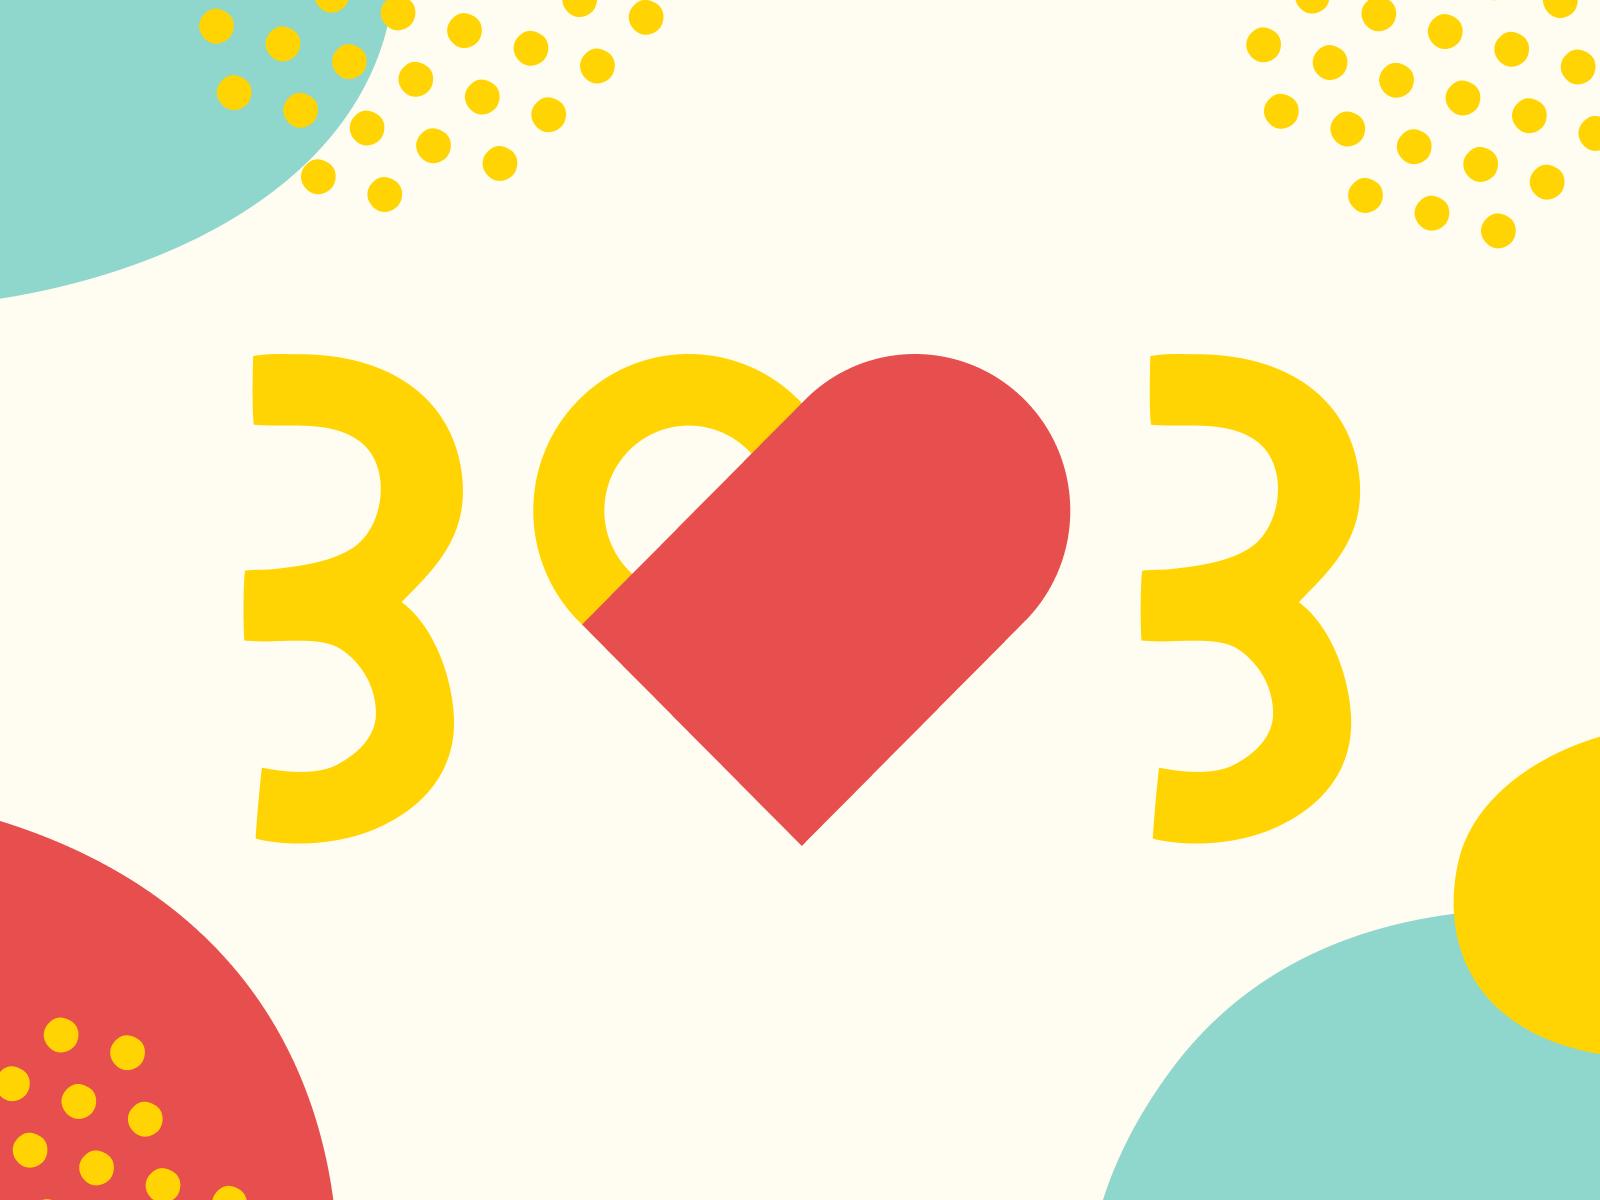 Dribbbble logo v1